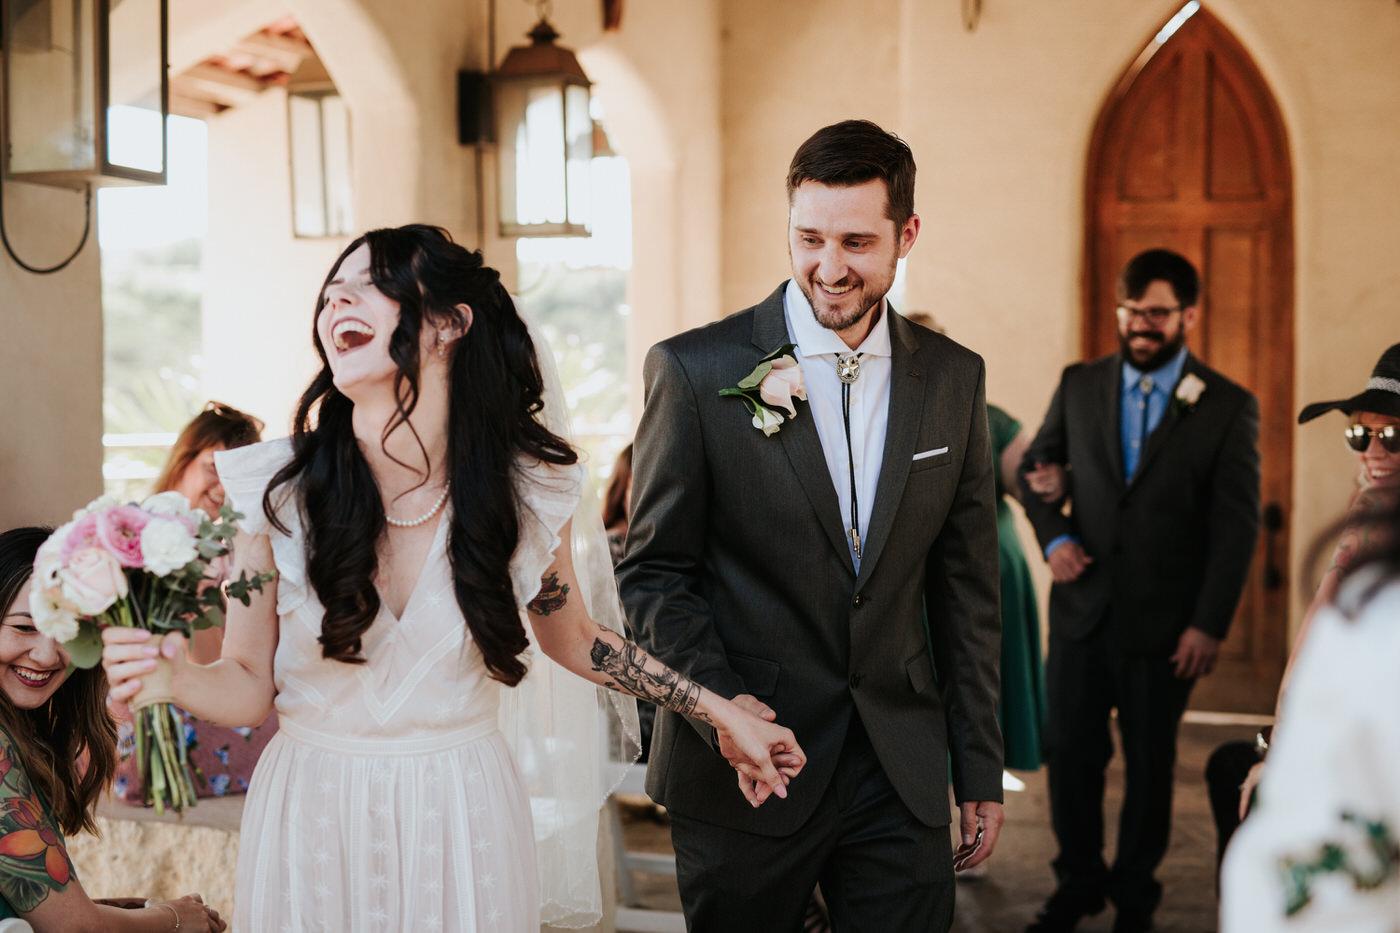 Couple getting married at Chapel Dulcinea